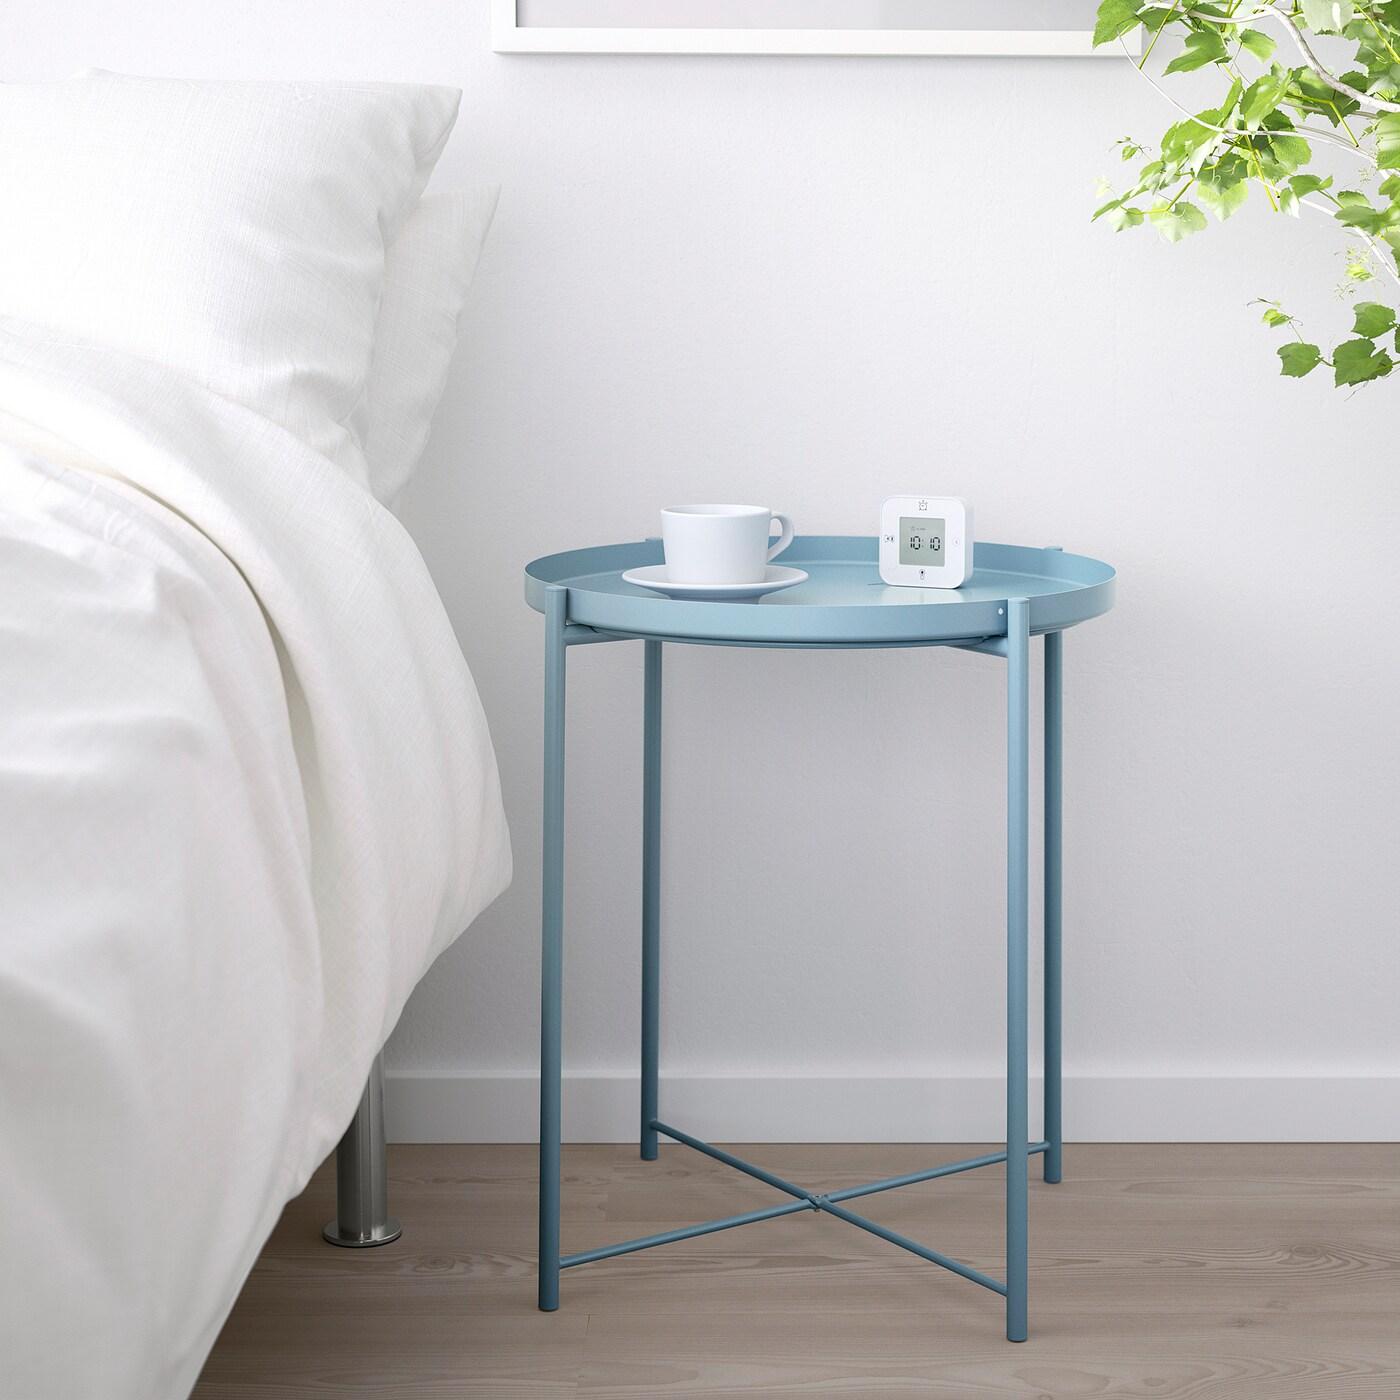 "GLADOM Table-plateau - bleu 177 17/17x170 17/17 "" (417x173 cm)"